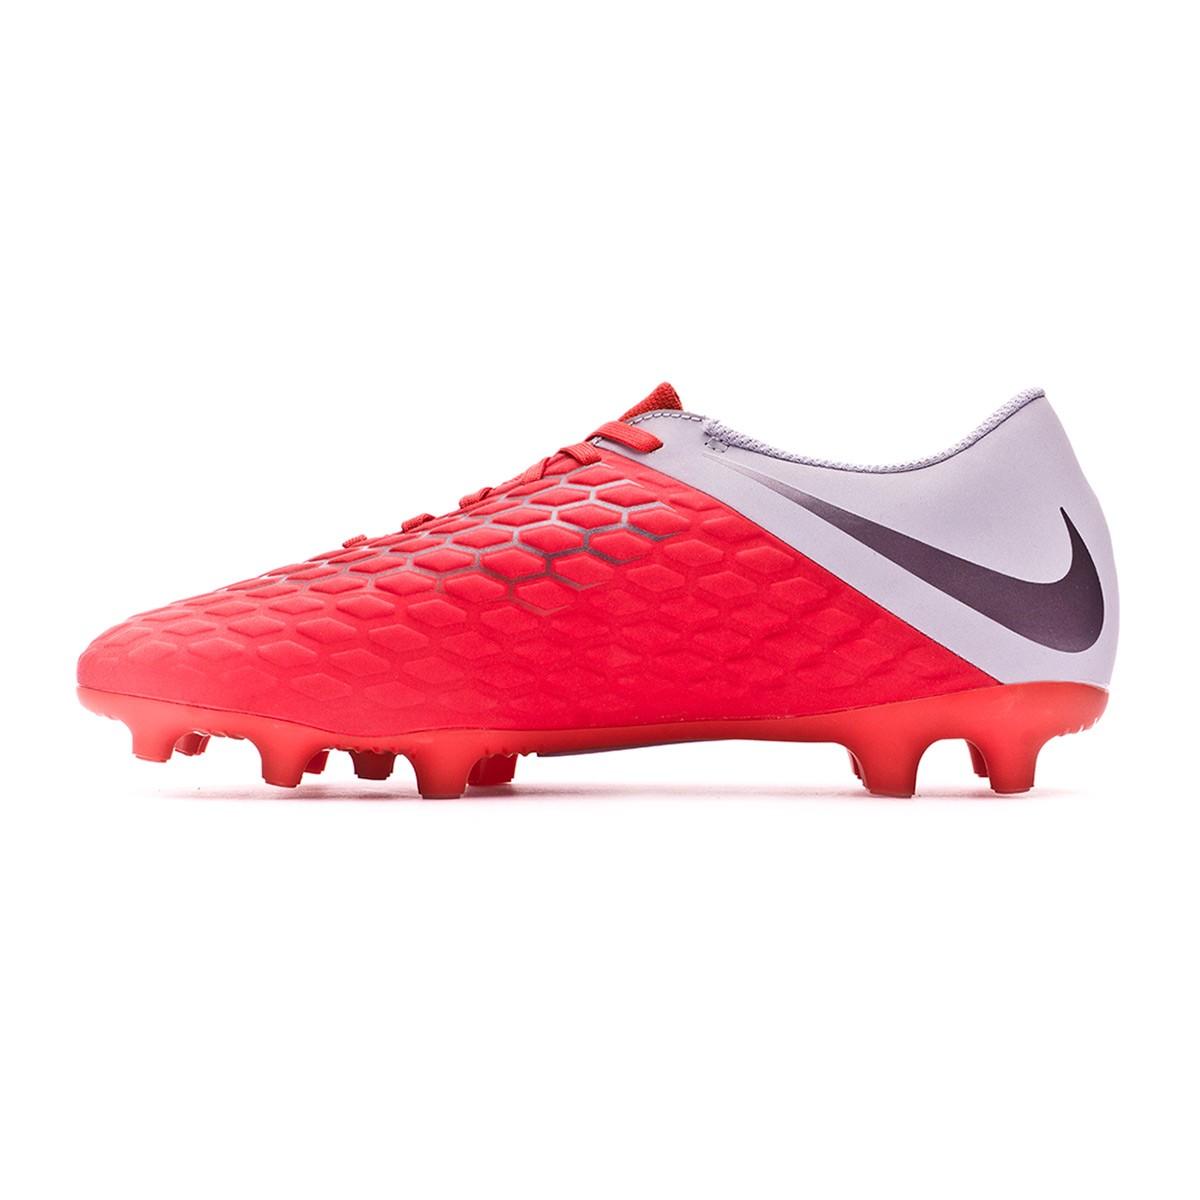 1f5bc5cd0 Football Boots Nike Hypervenom Phantom III Club FG Light crimson-Metallic  dark grey-Wolf grey - Tienda de fútbol Fútbol Emotion